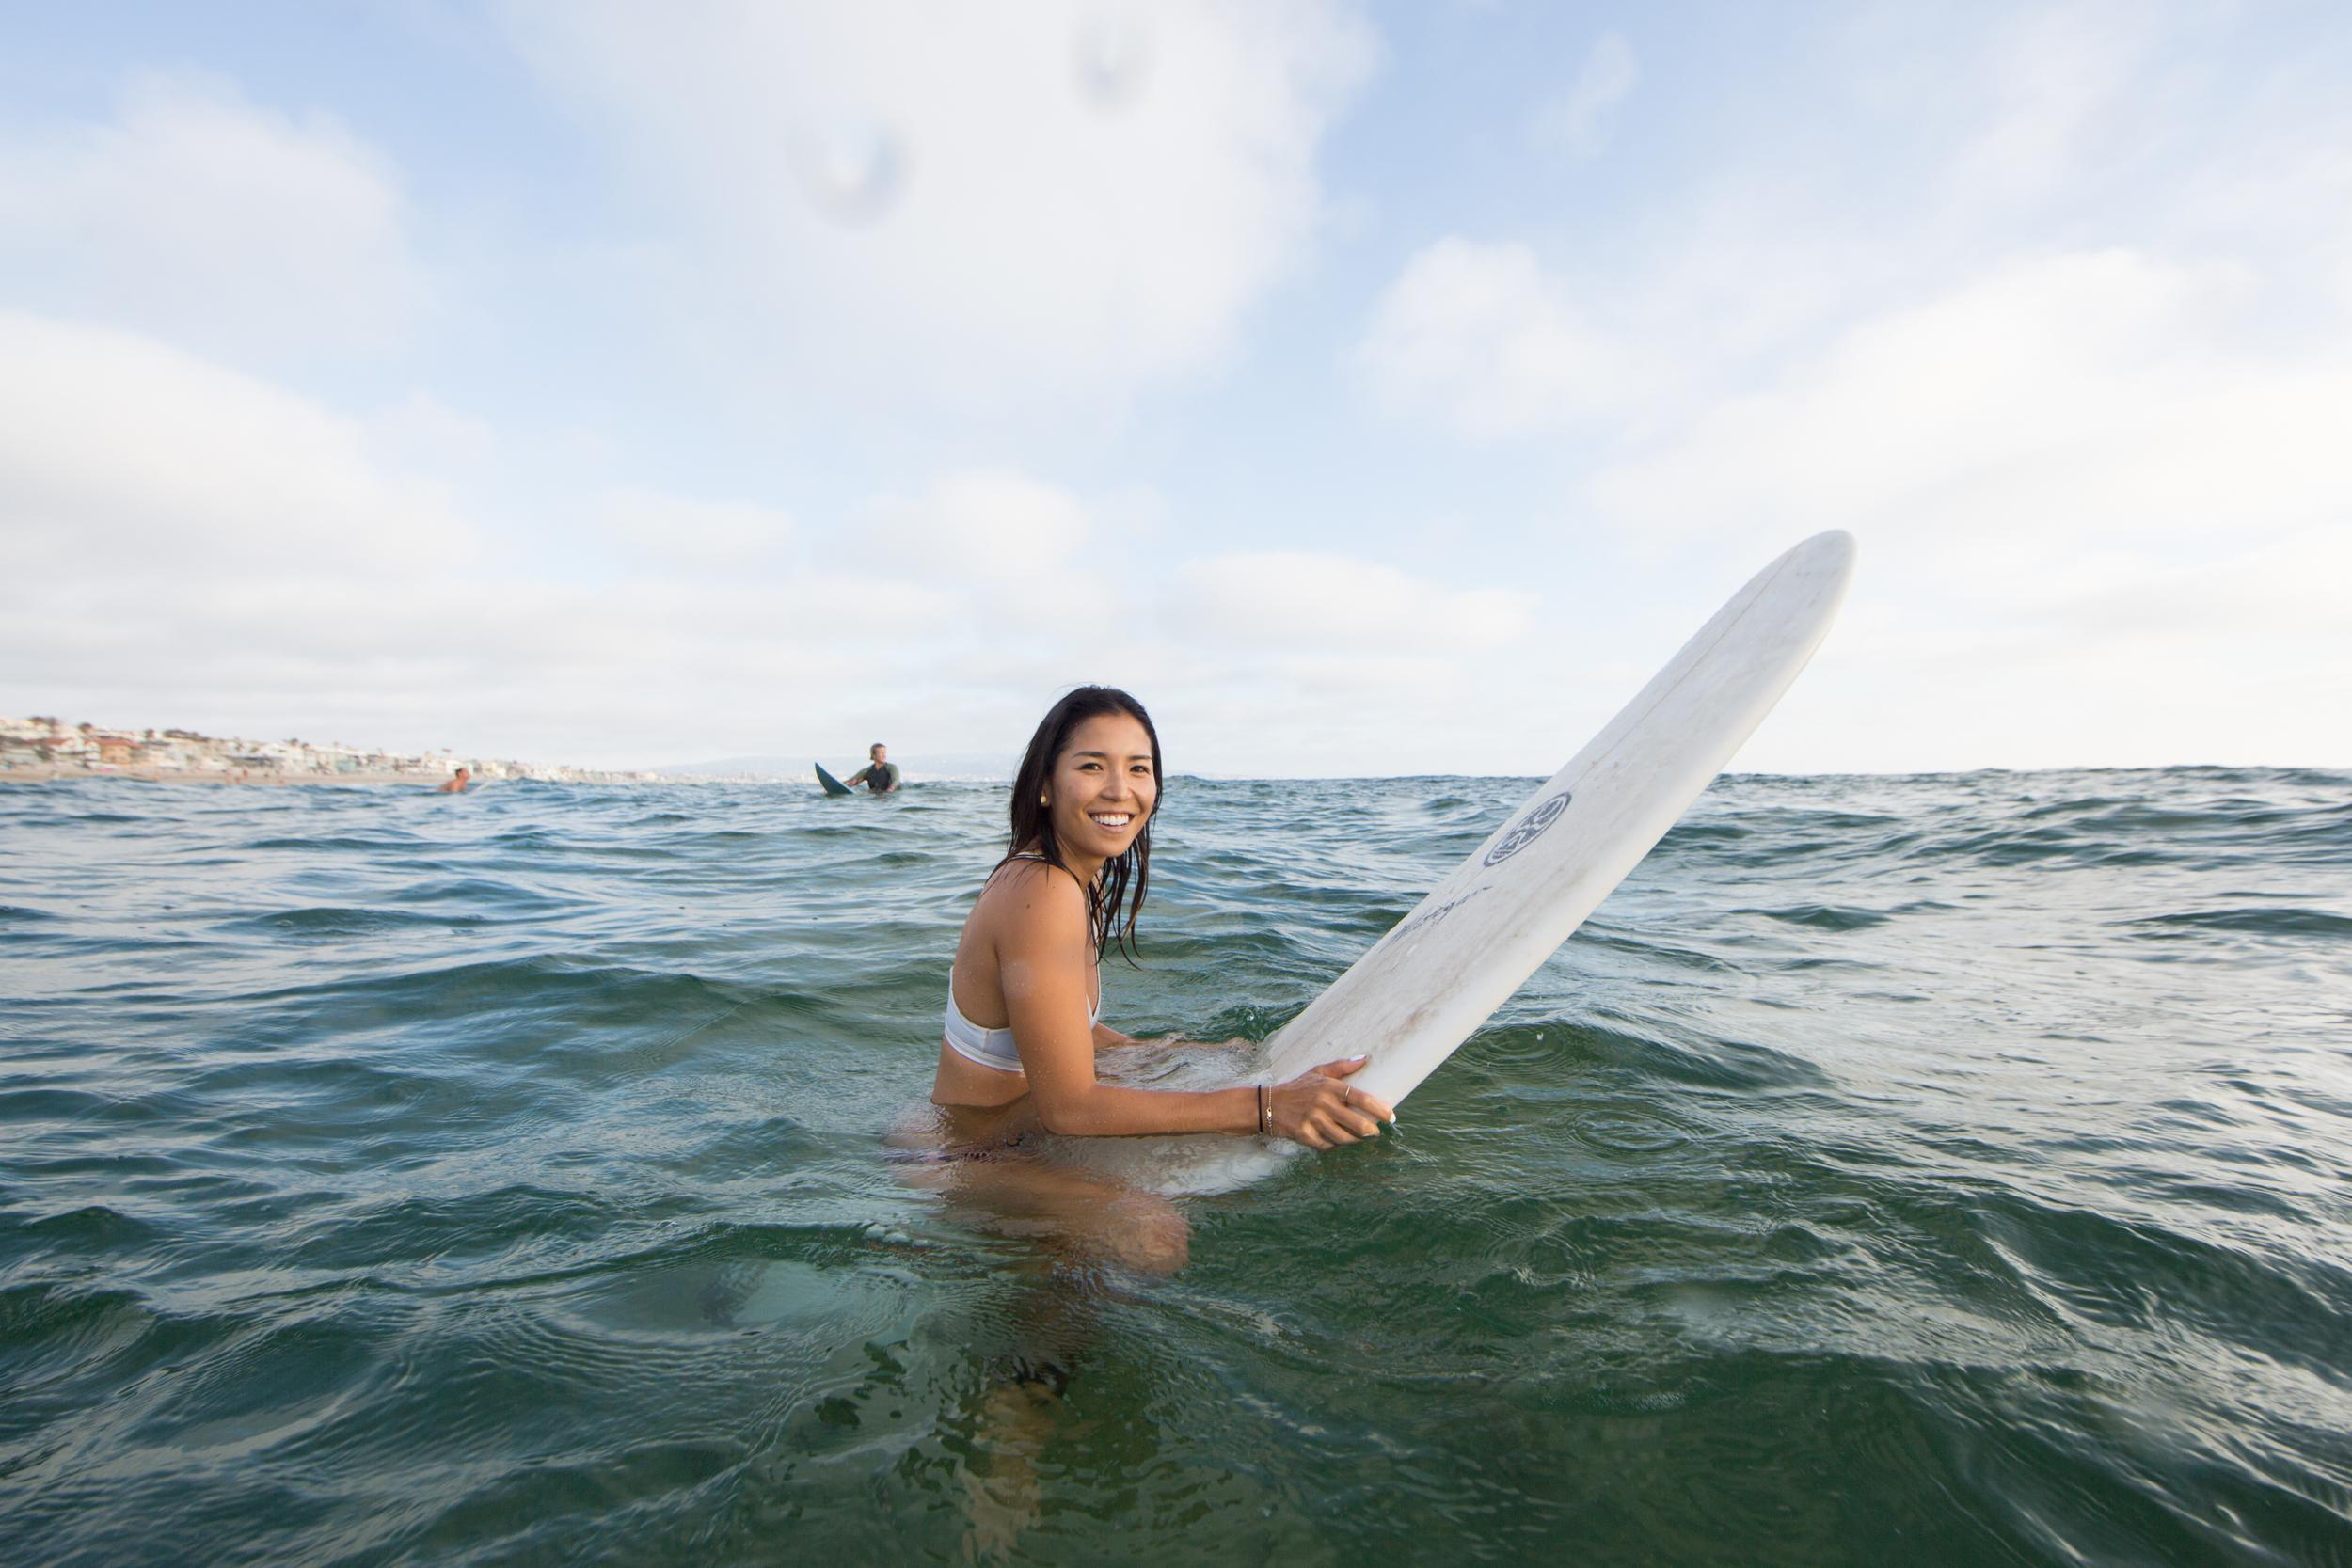 Surfing the waves at the Manhattan Beach Pier